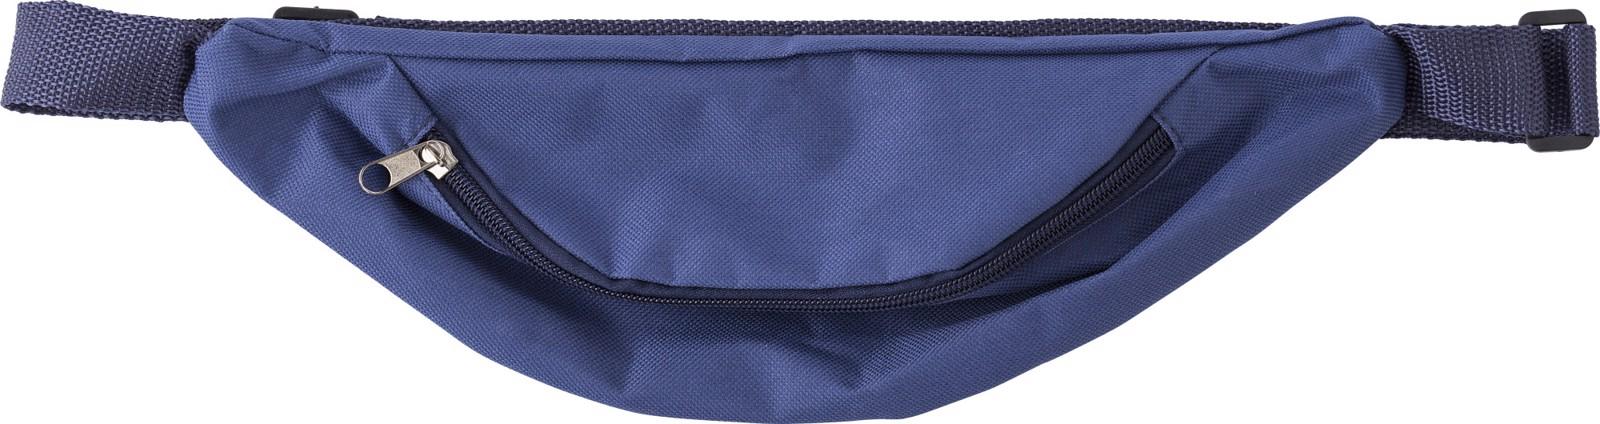 Oxford fabric waist bag - Cobalt Blue